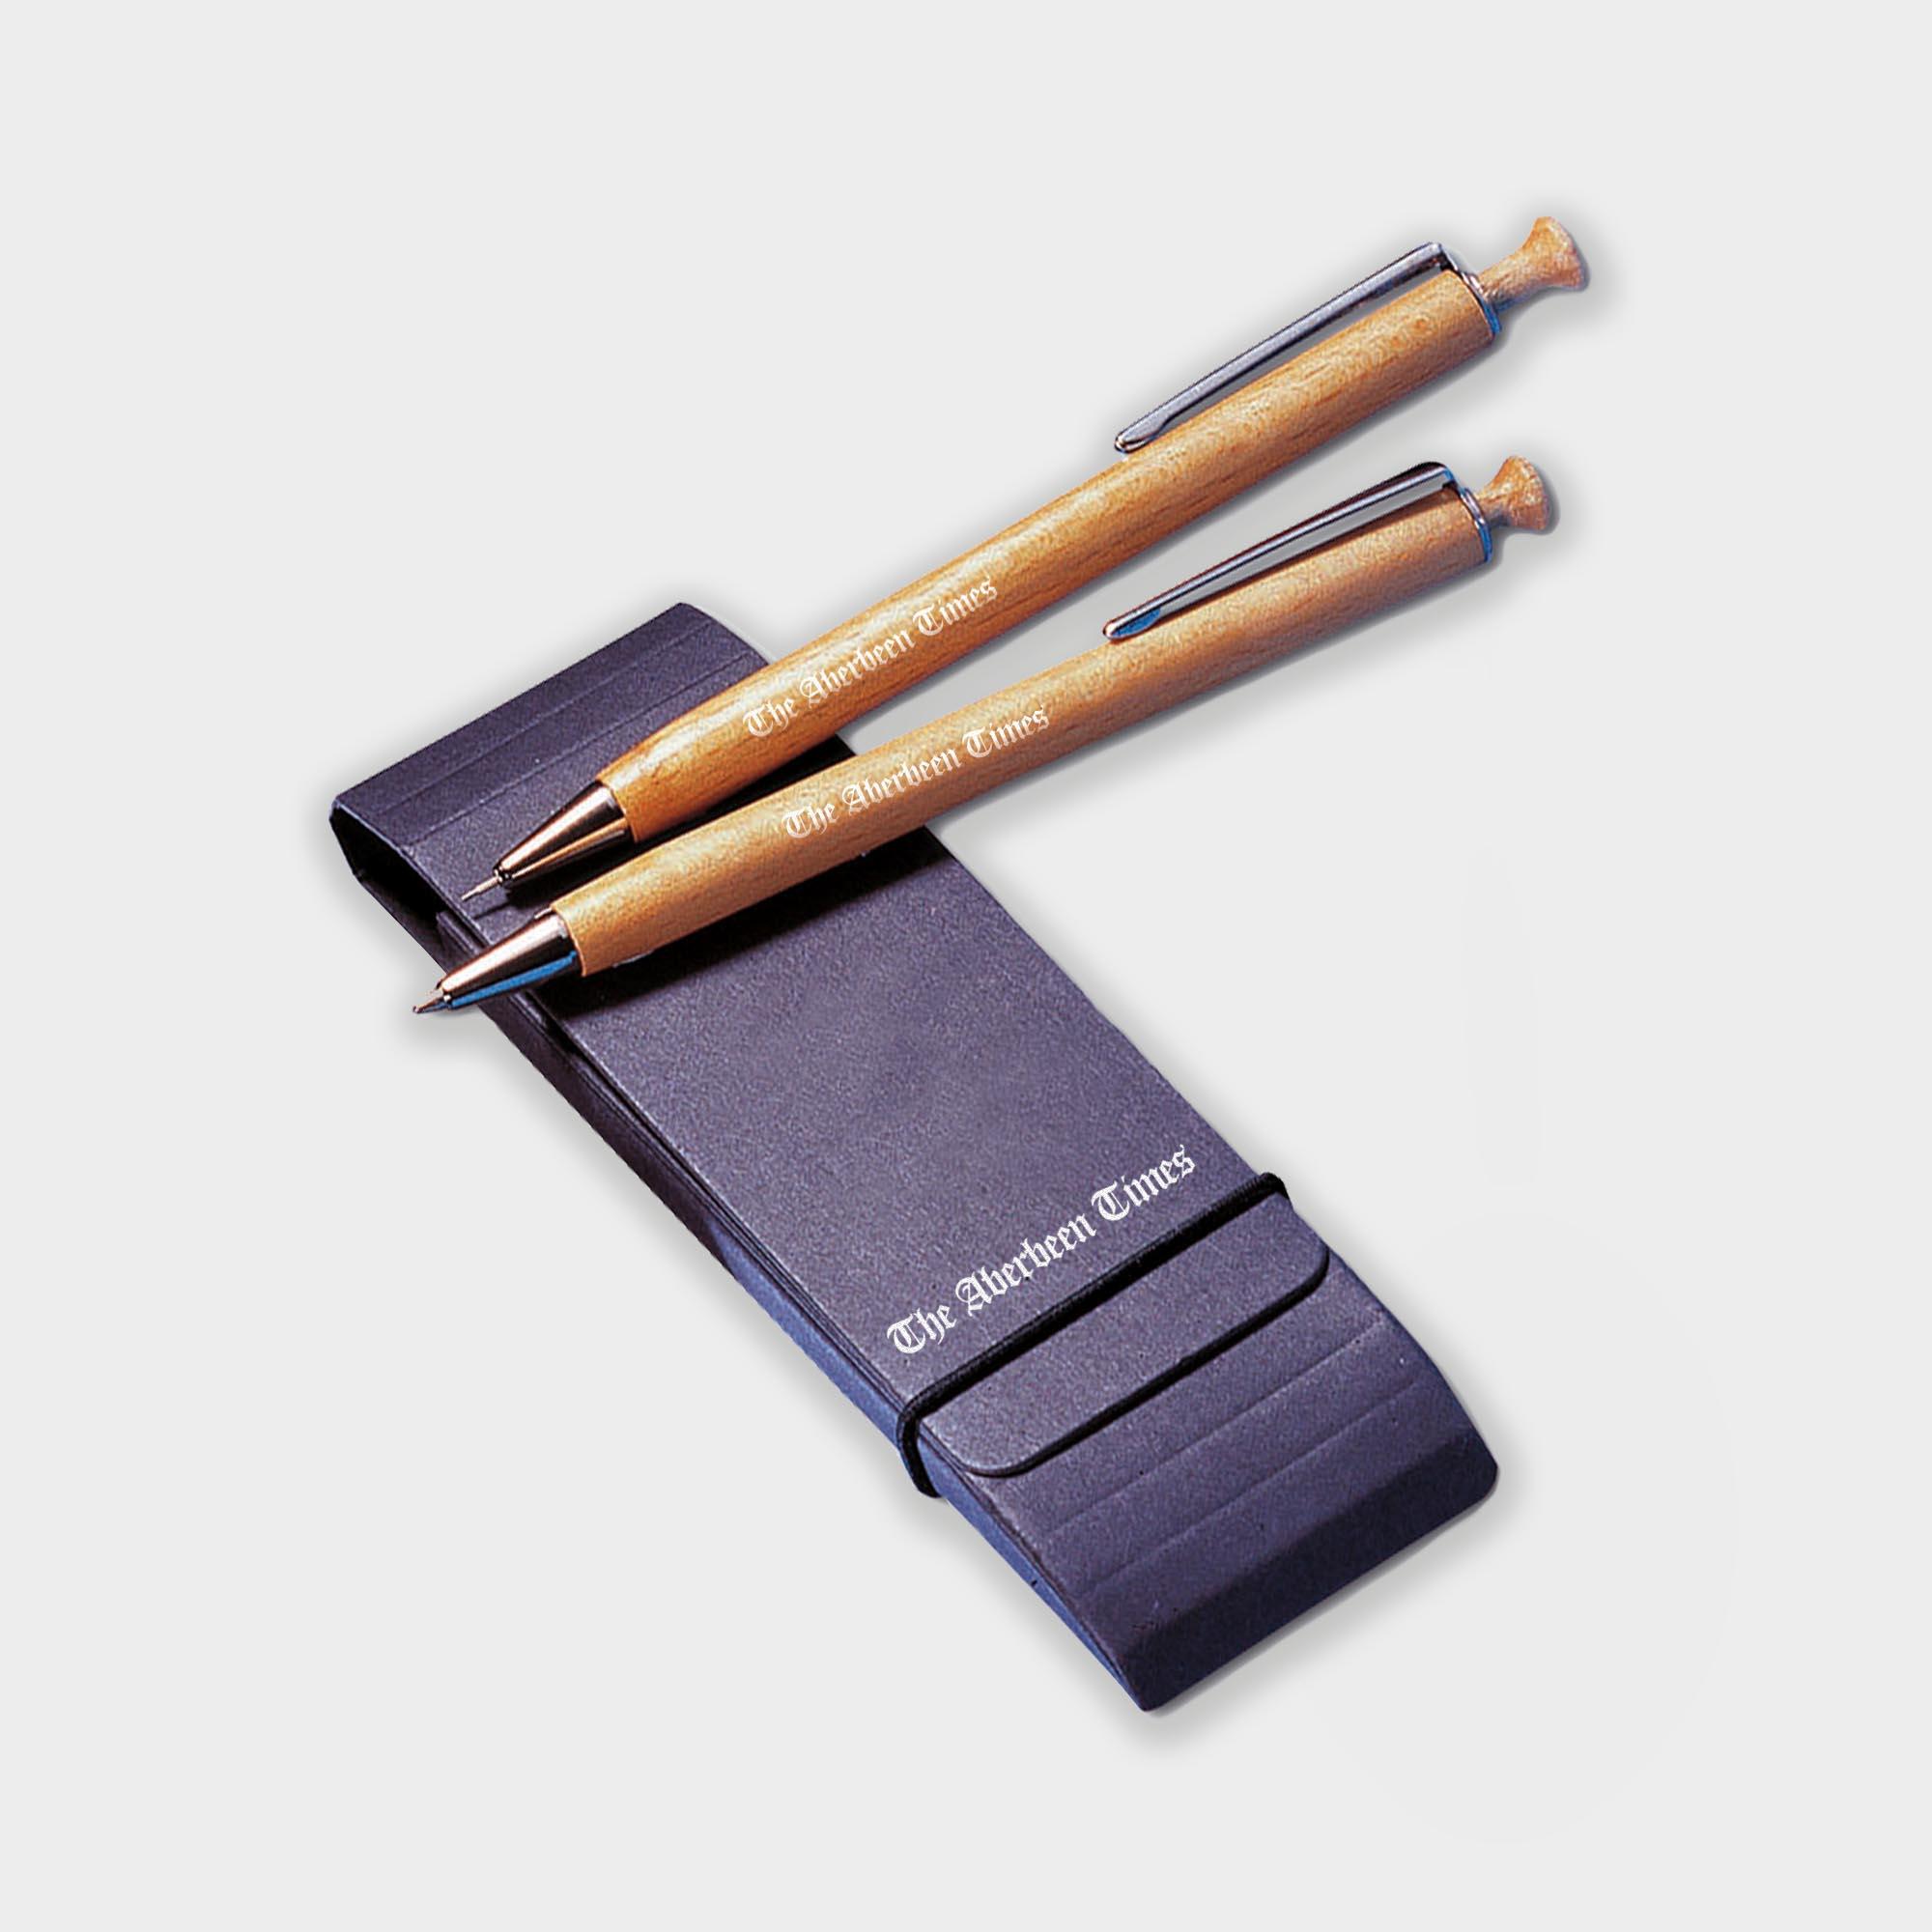 Promotional Albero Pen & Pencil Sustainable Set